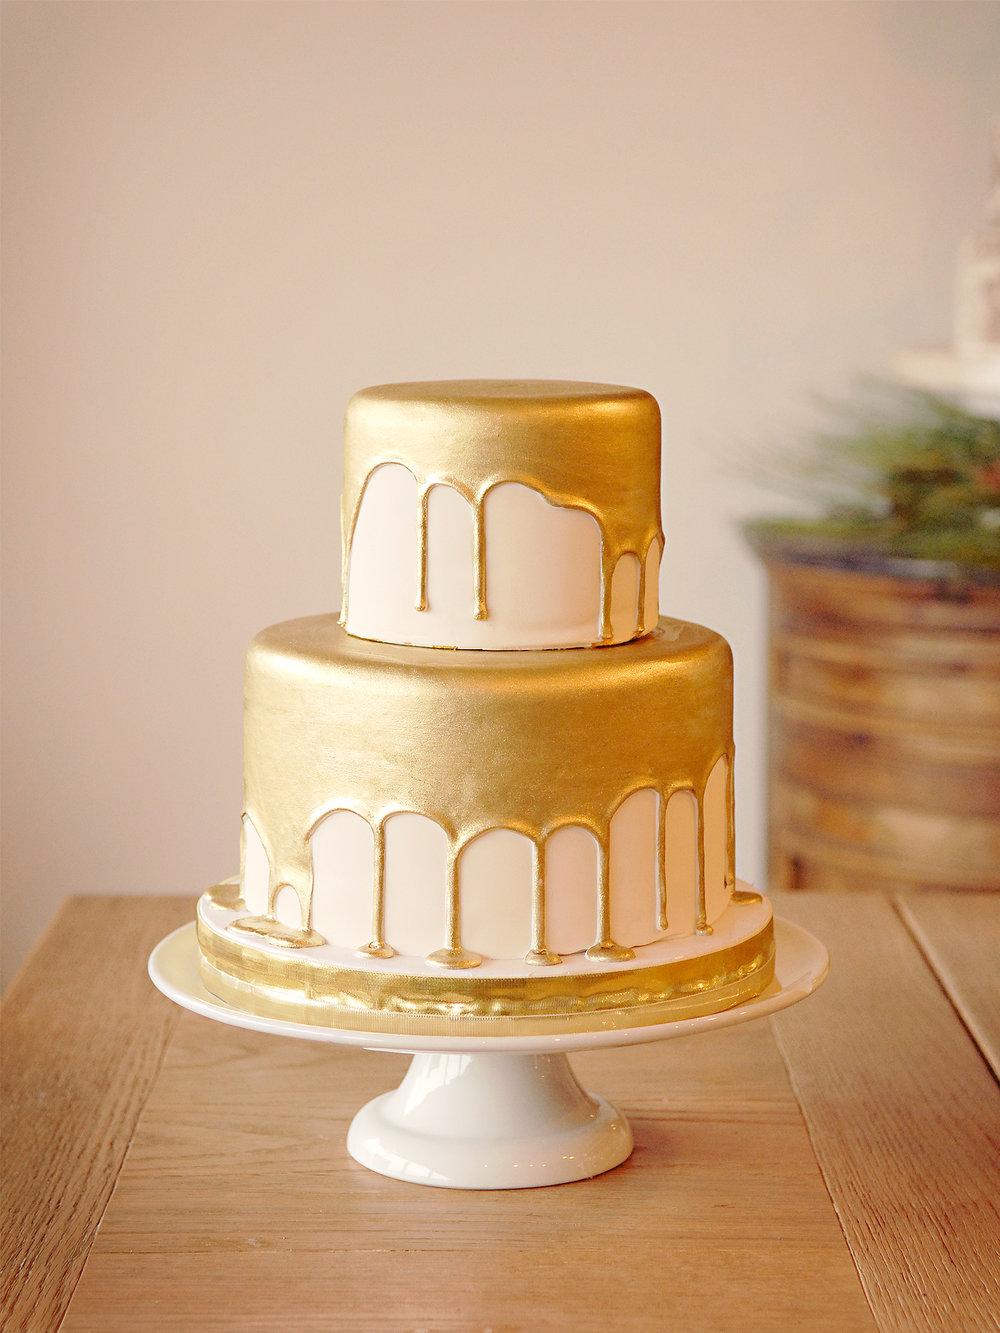 other_custom_cakes_017.jpg